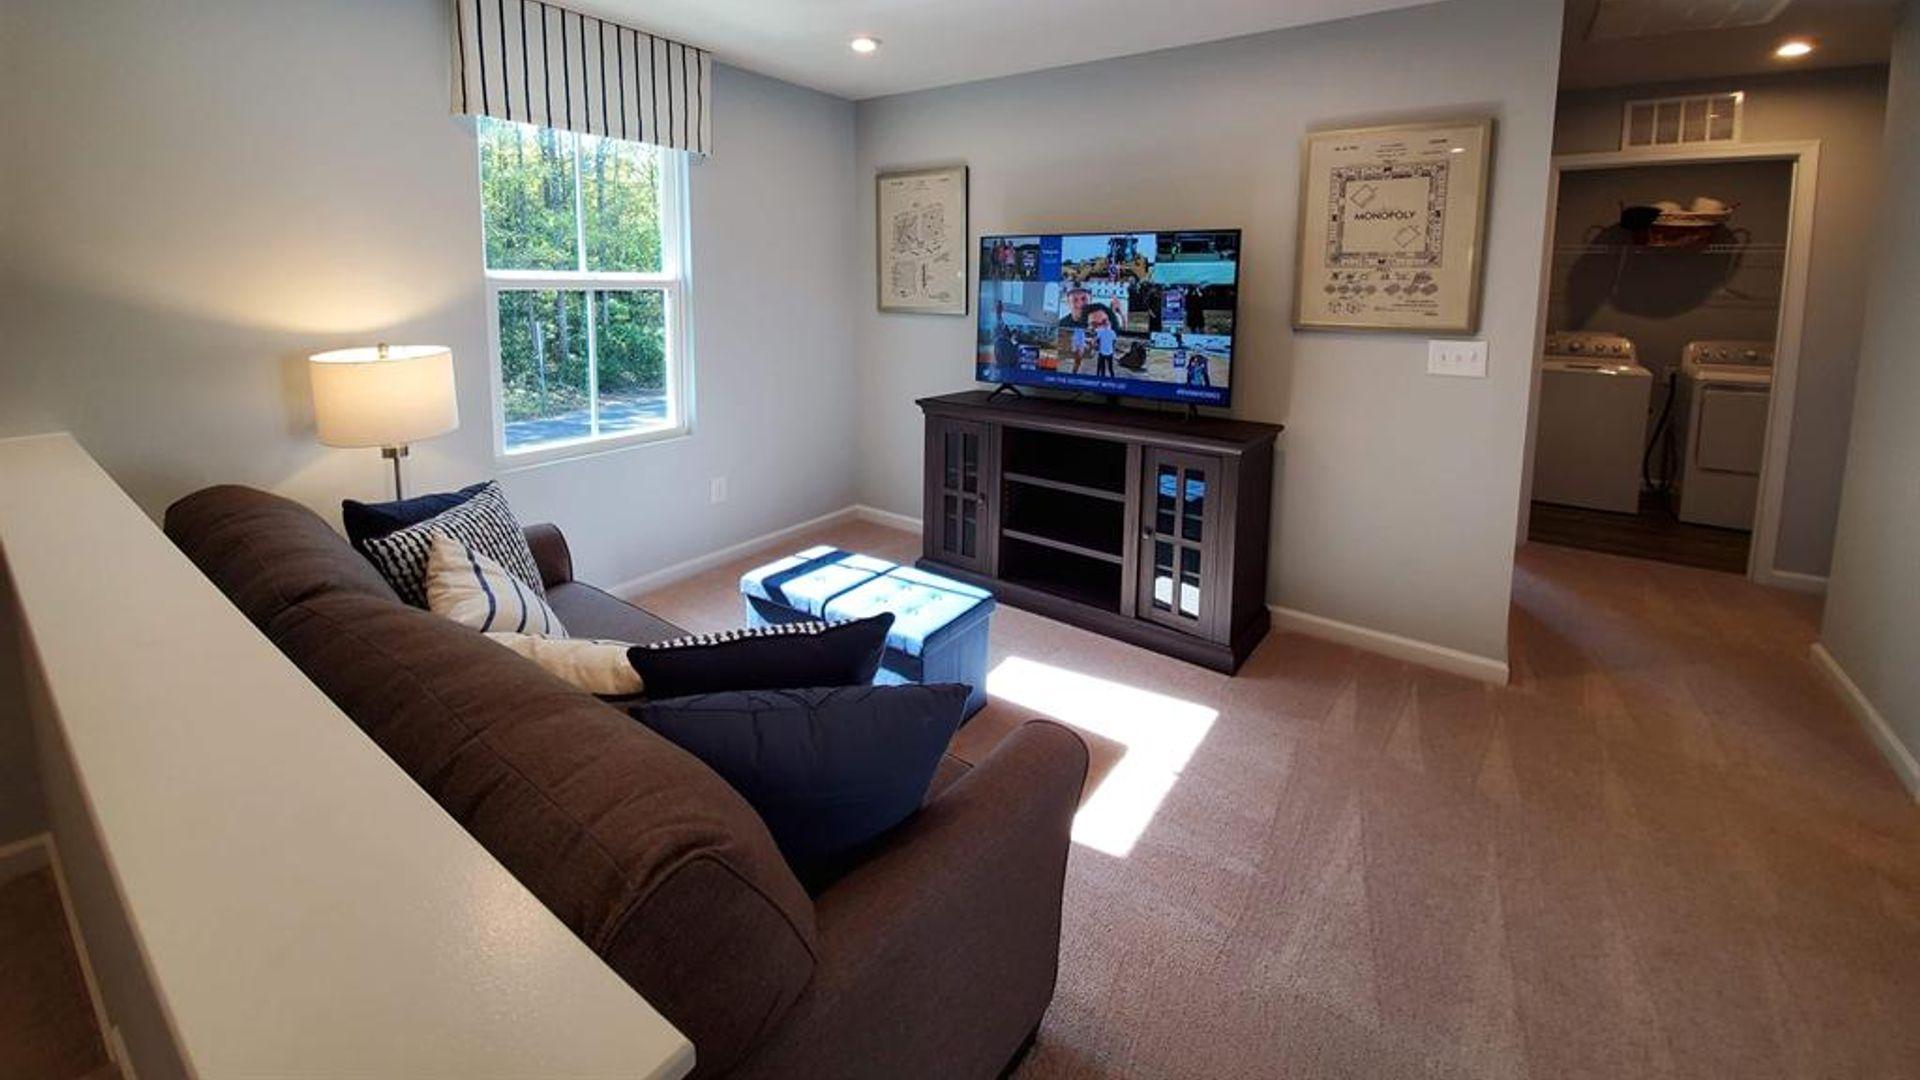 1 bedroom apartment at 2929 cindy lane charlotte nc